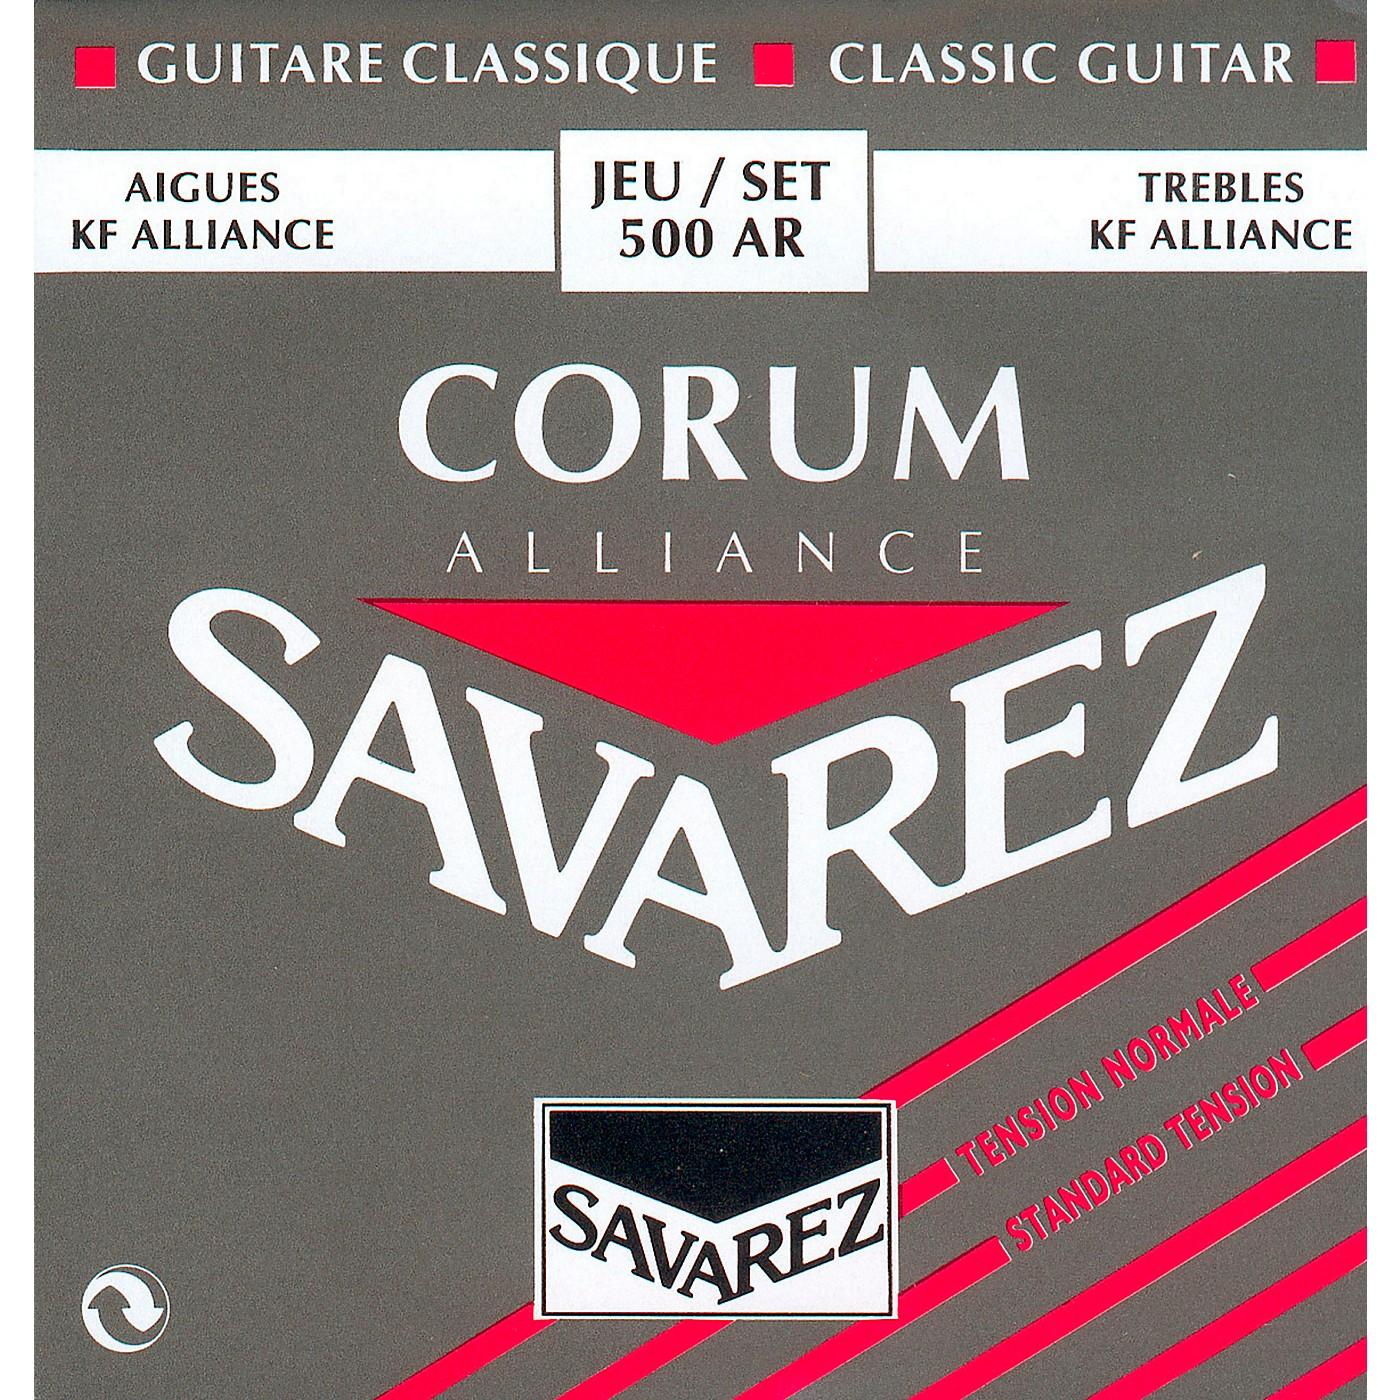 Savarez 500AR Alliance Corum Normal Tension Guitar Strings thumbnail